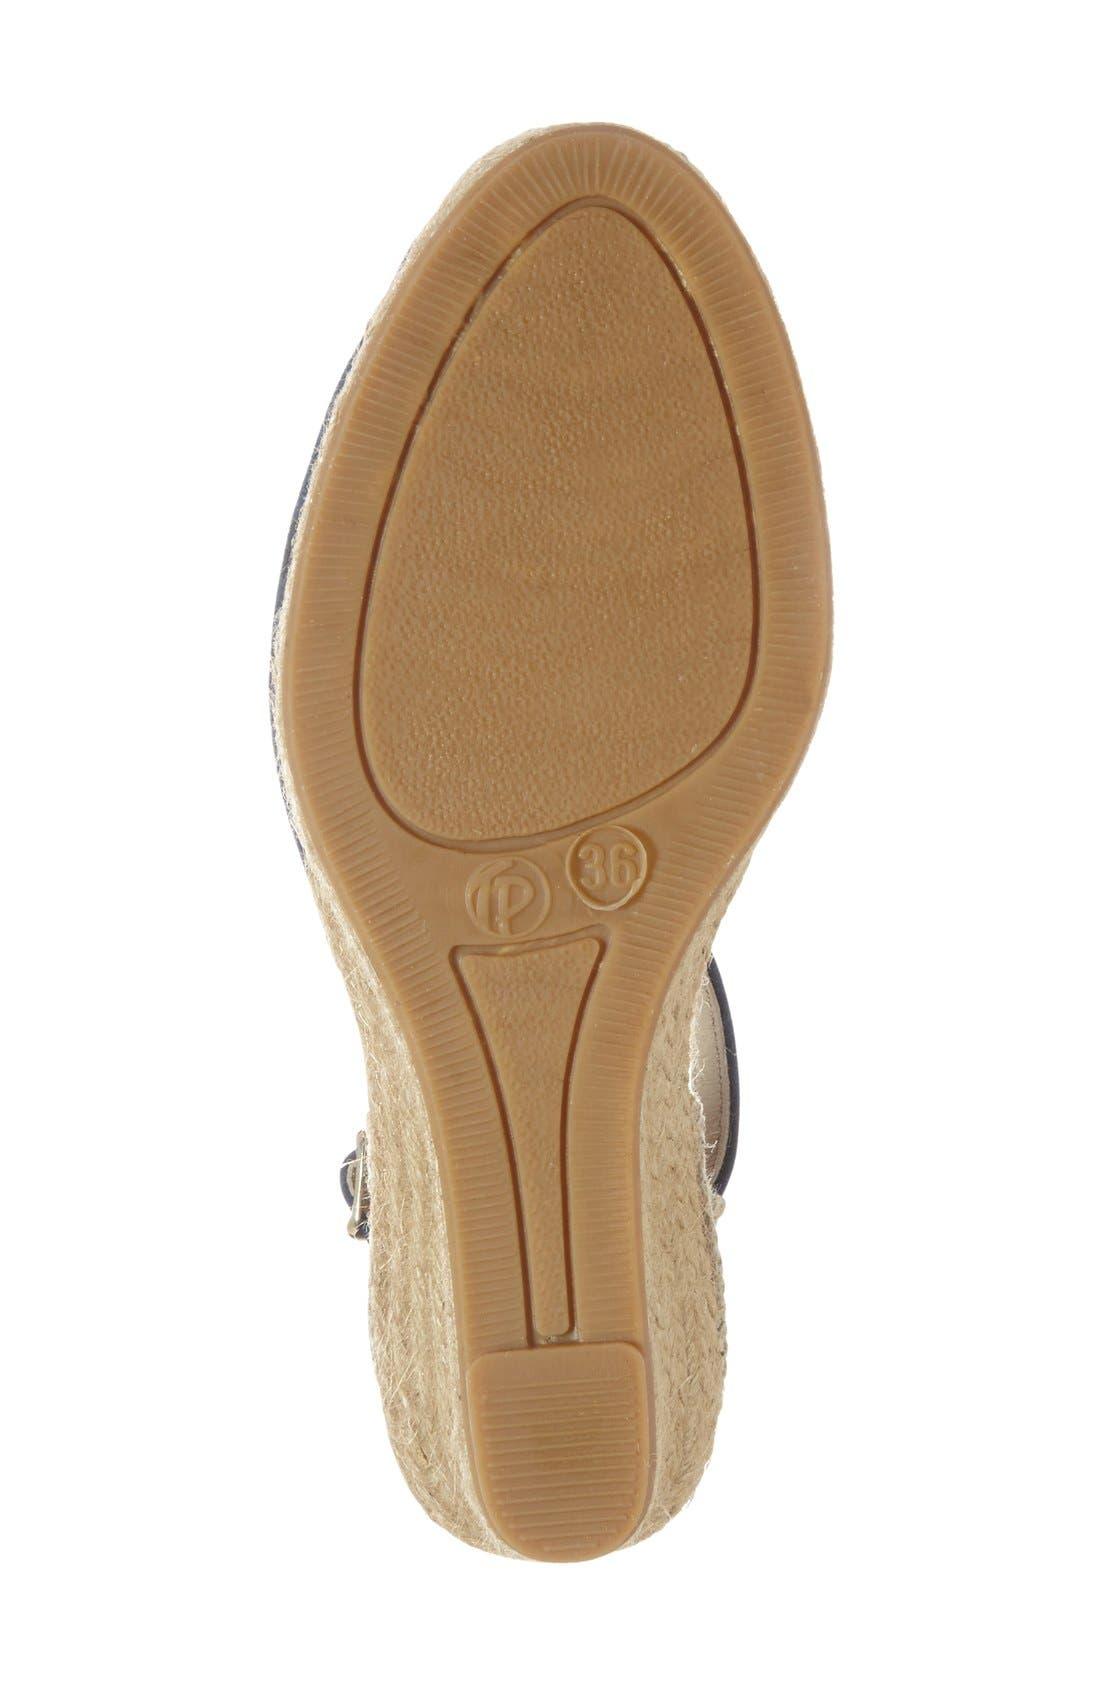 TONI PONS, 'Lloret-5' Espadrille Wedge Sandal, Alternate thumbnail 4, color, NAVY SUEDE